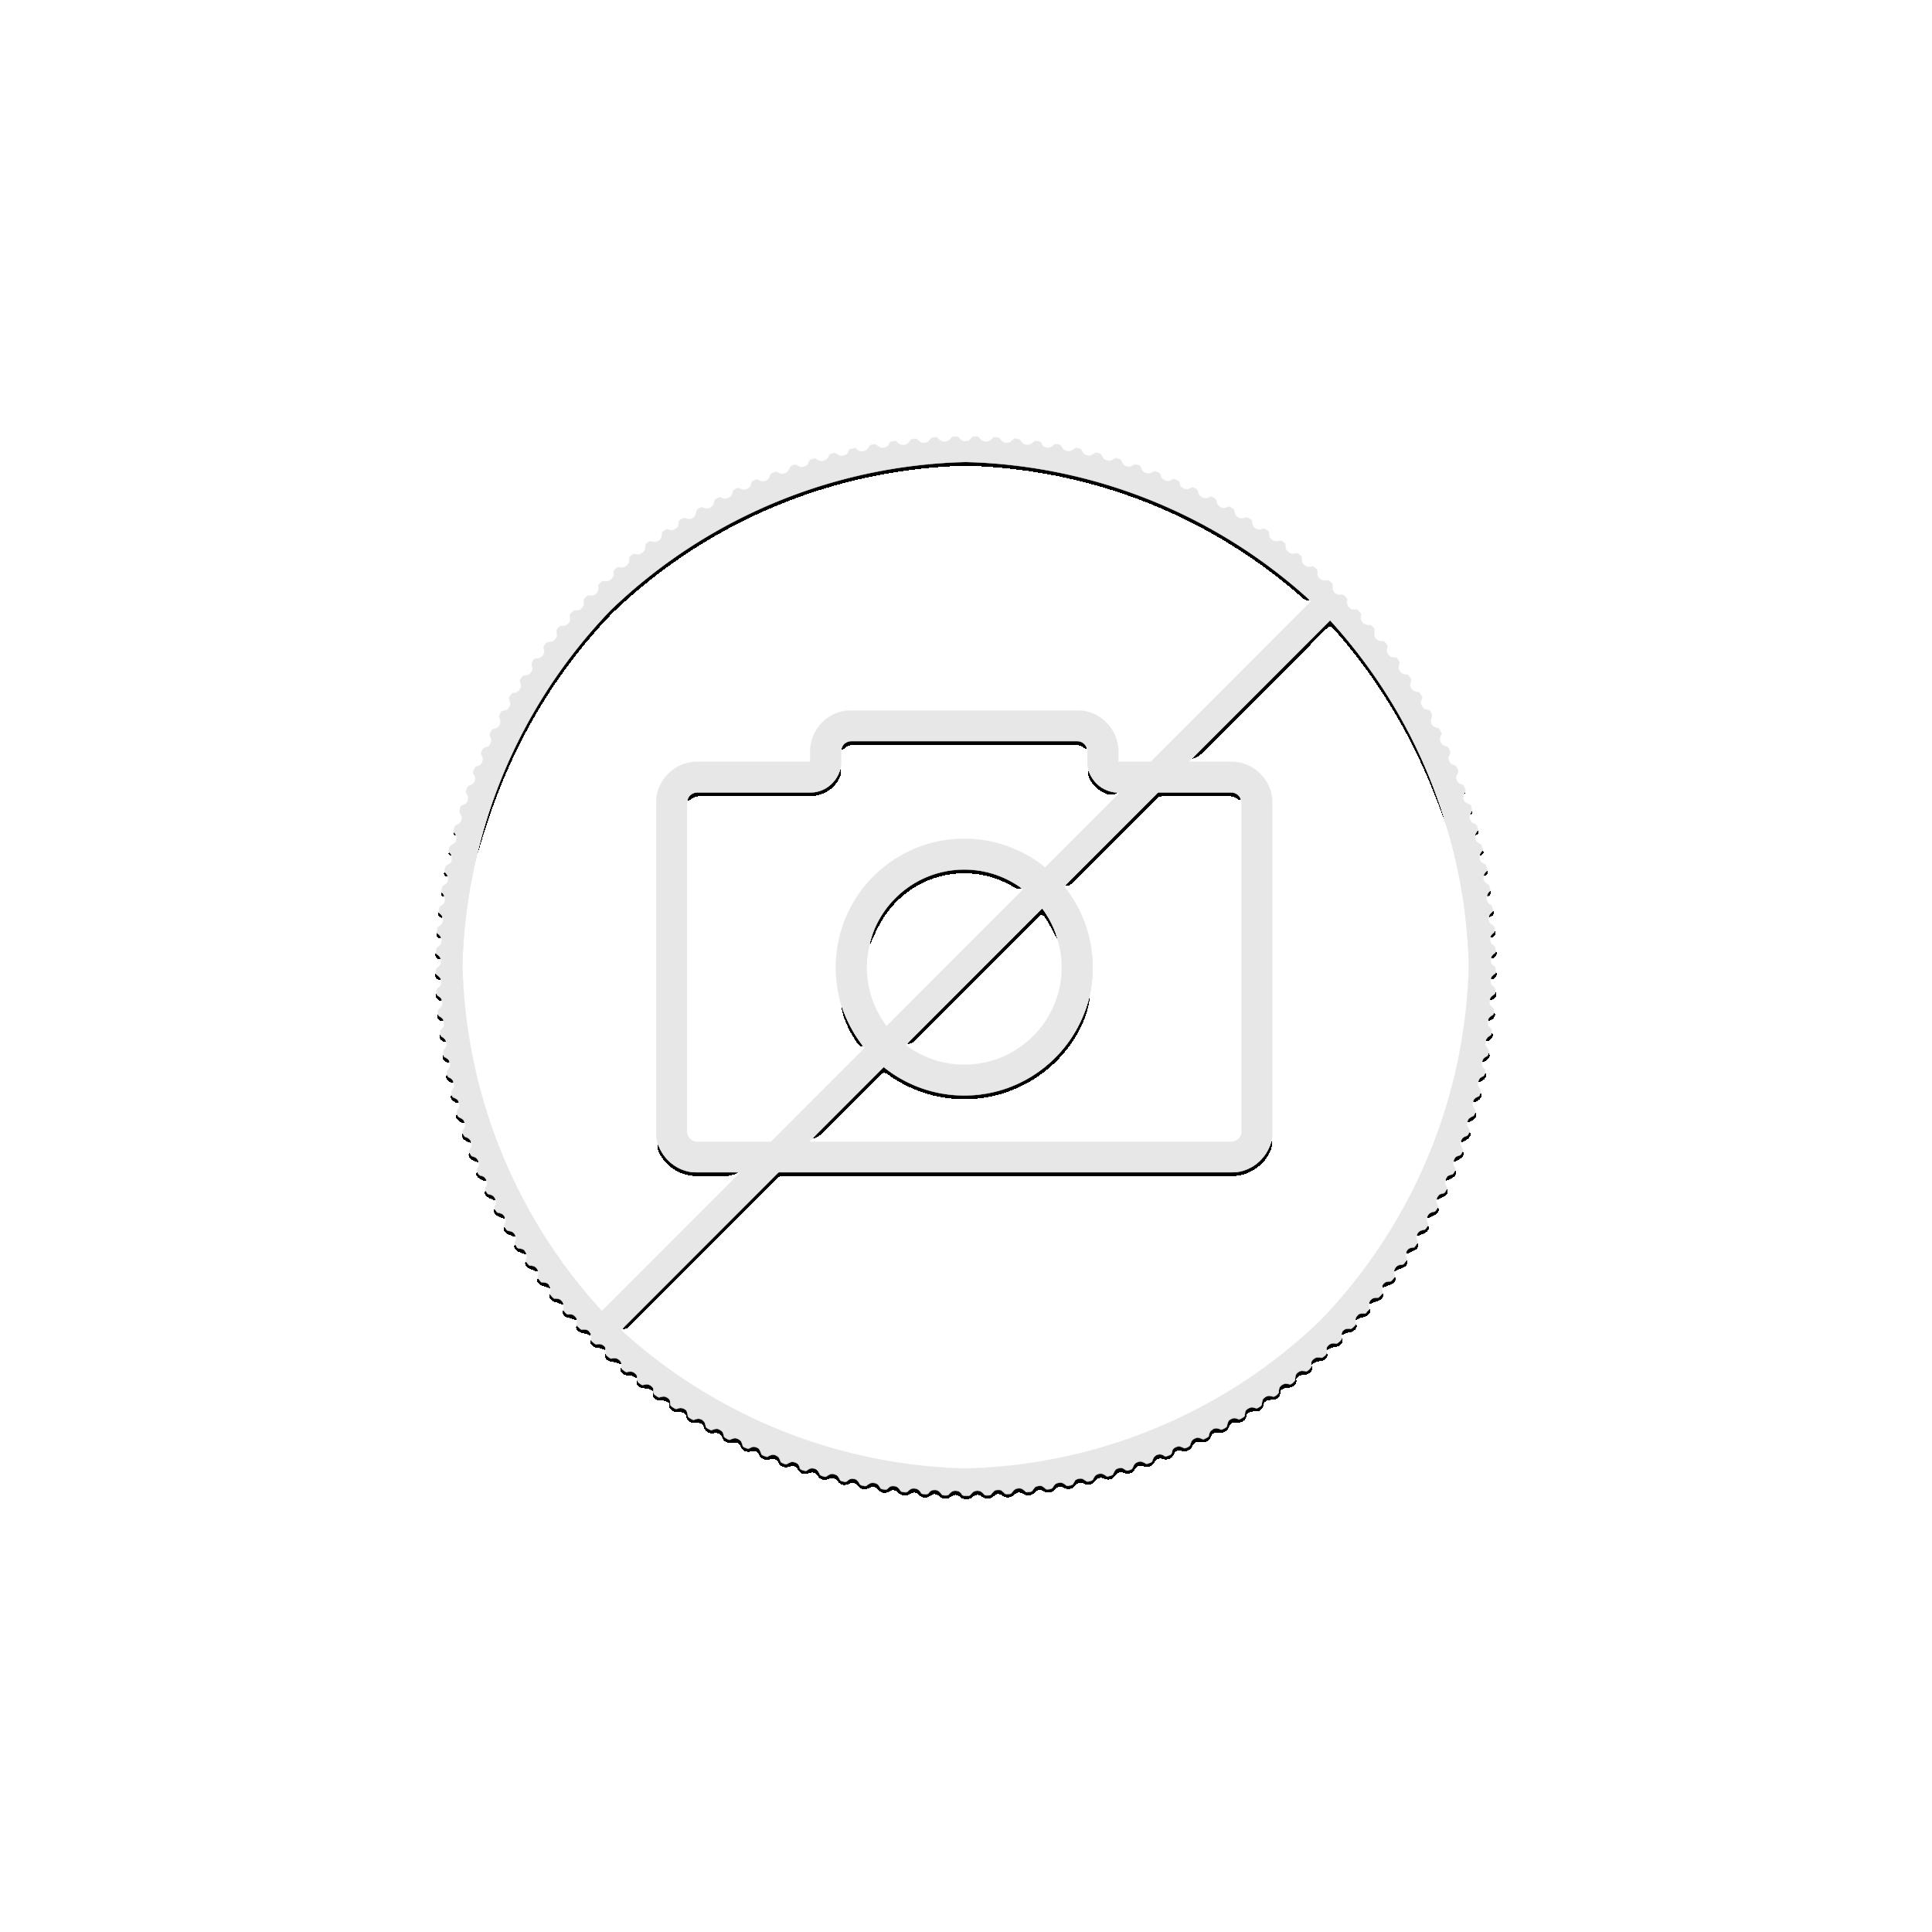 5-Delige set gouden munten Panda 2020